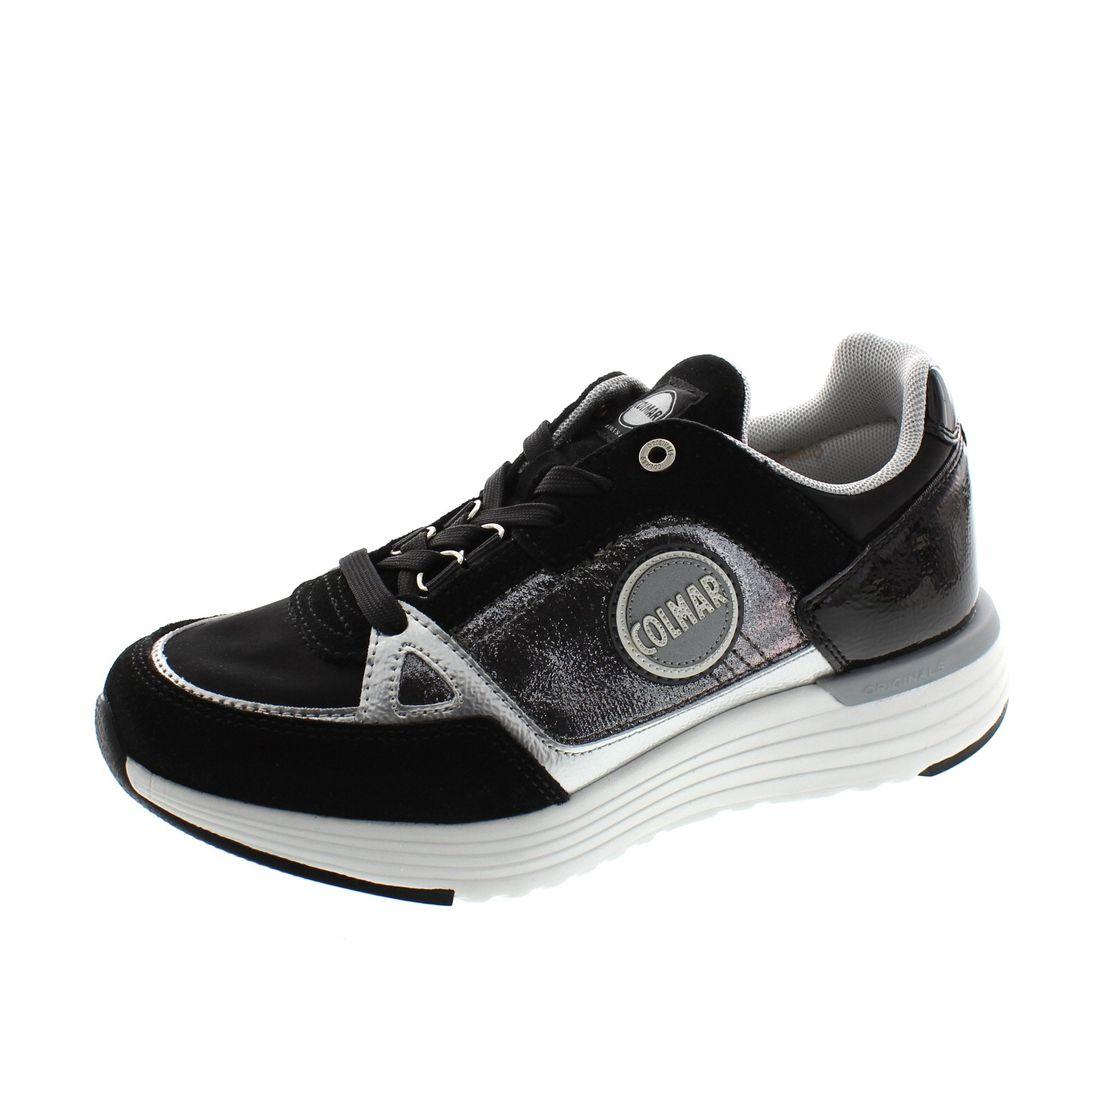 COLMAR Damenschuhe - Sneaker Supreme X-1 Gliss 116 - black